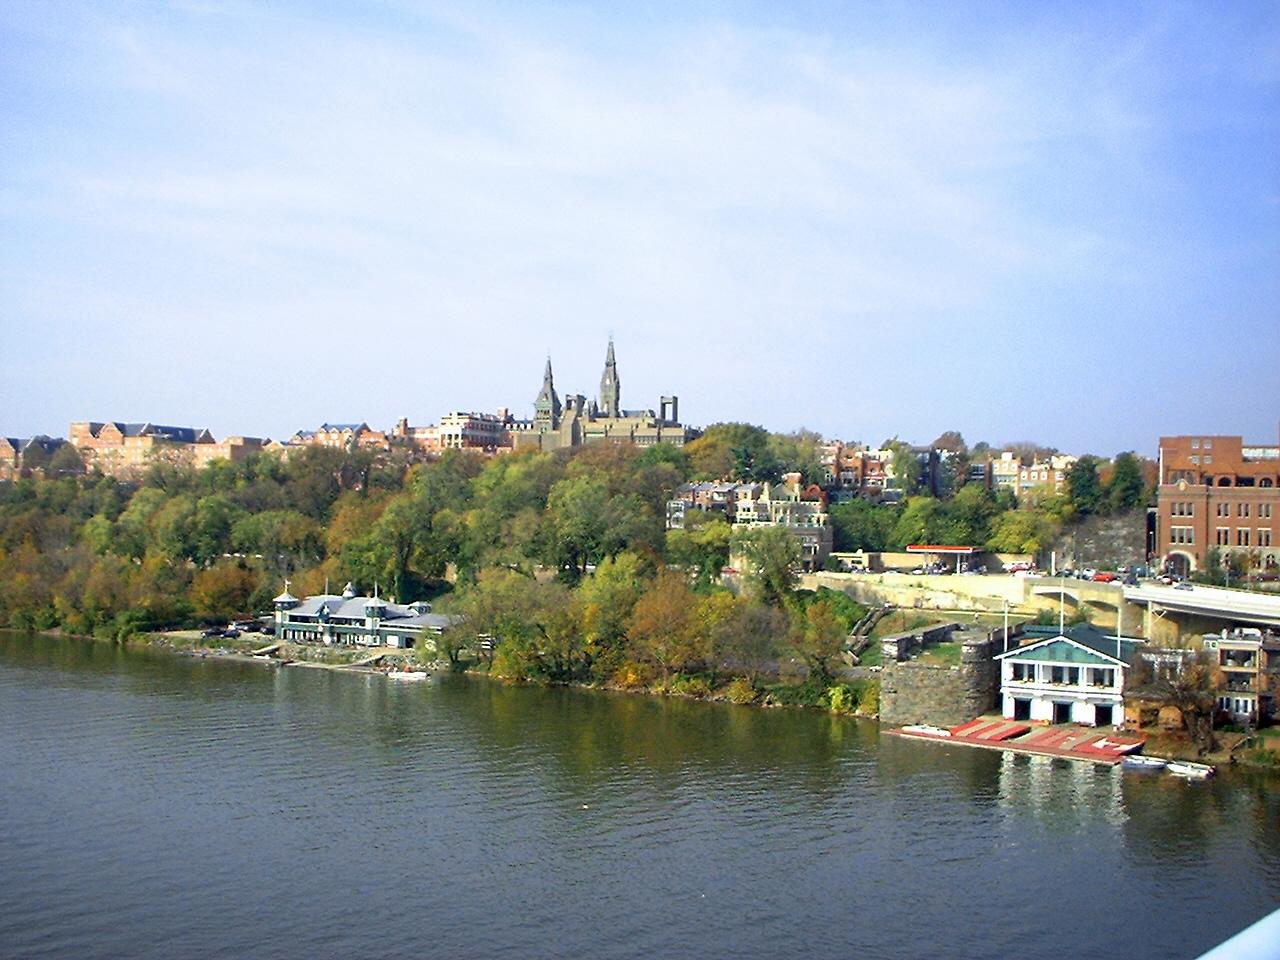 File:Georgetown University campus from the Key Bridge 2006.jpg